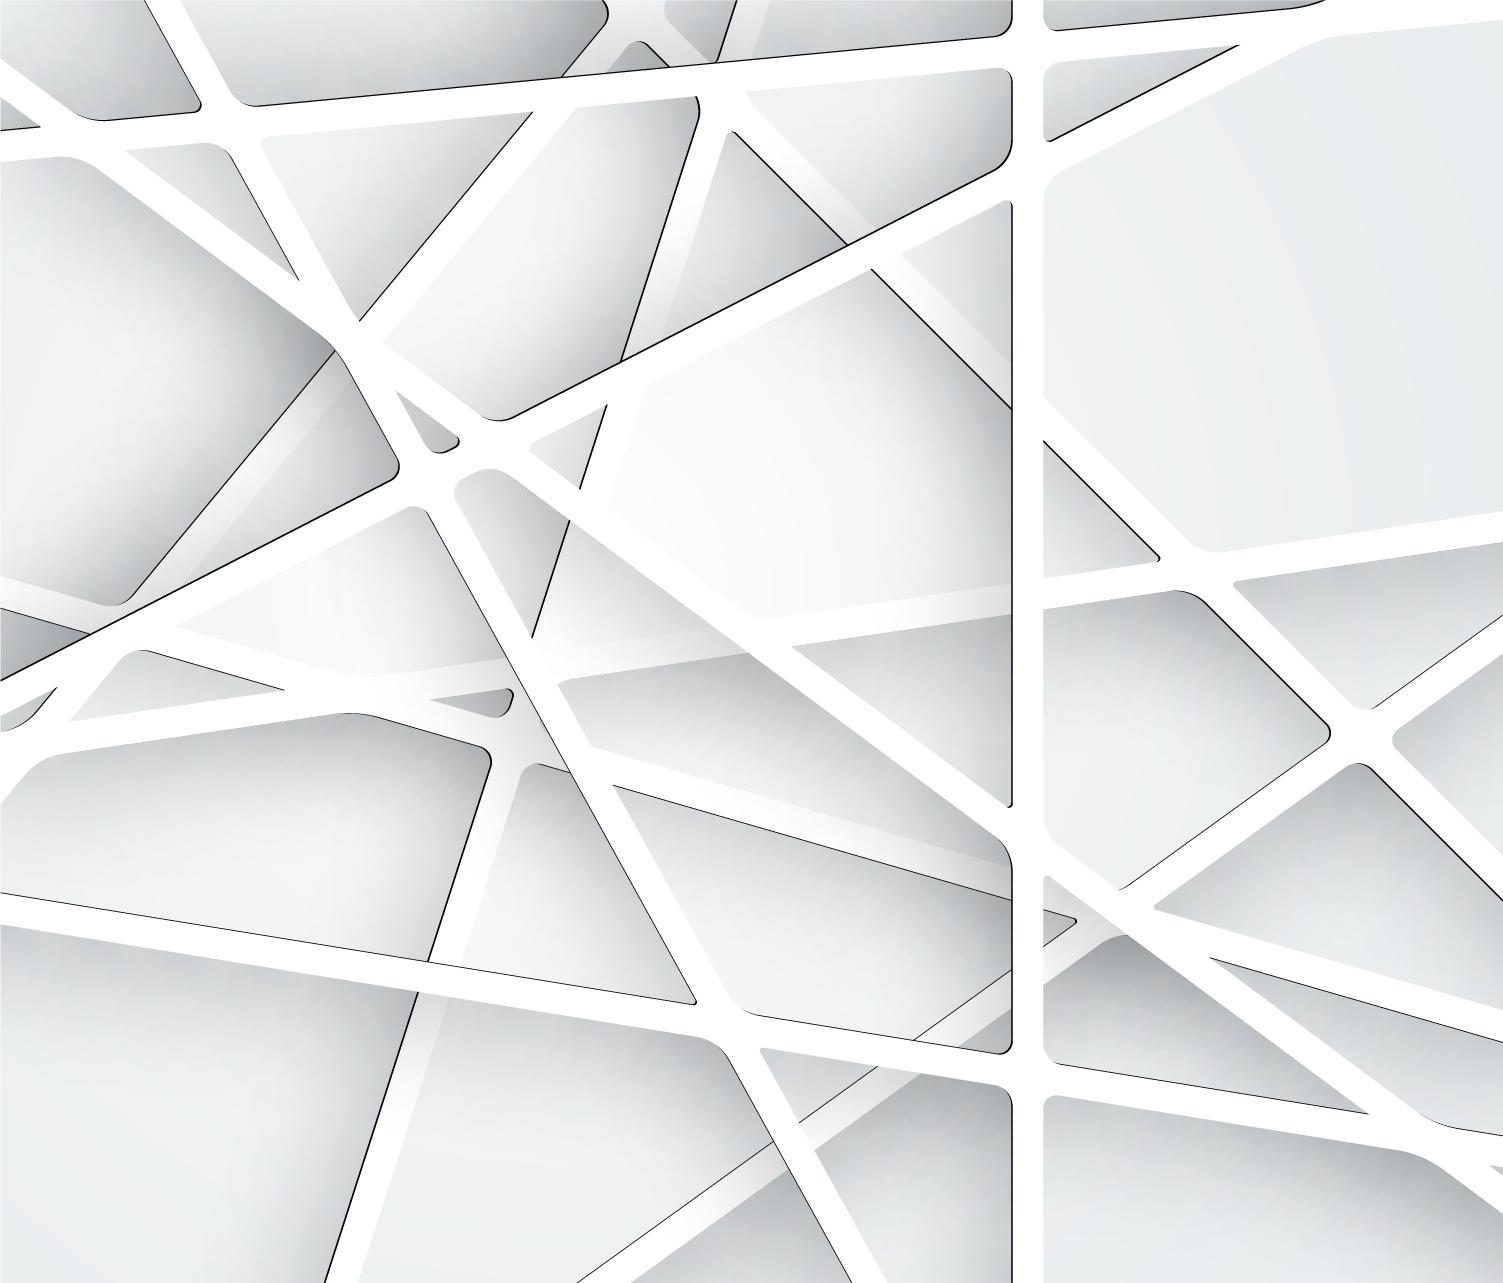 Lines - ArumVision